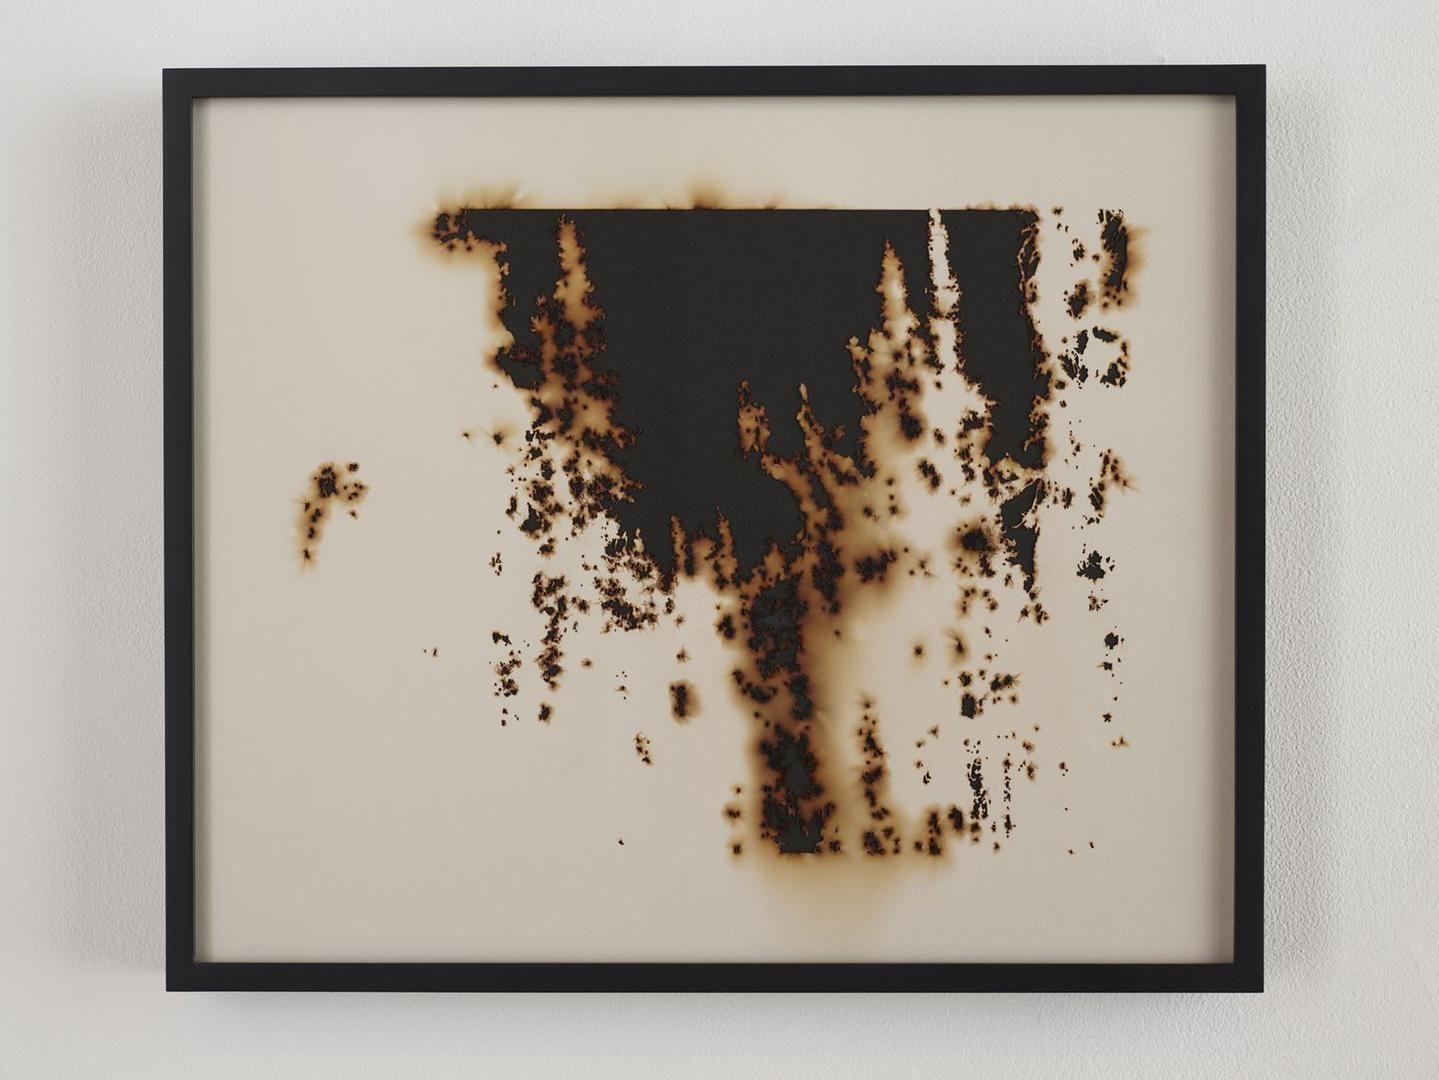 TERESITA FERNÁNDEZ Burned Landscape (America) 1(detail), 2017